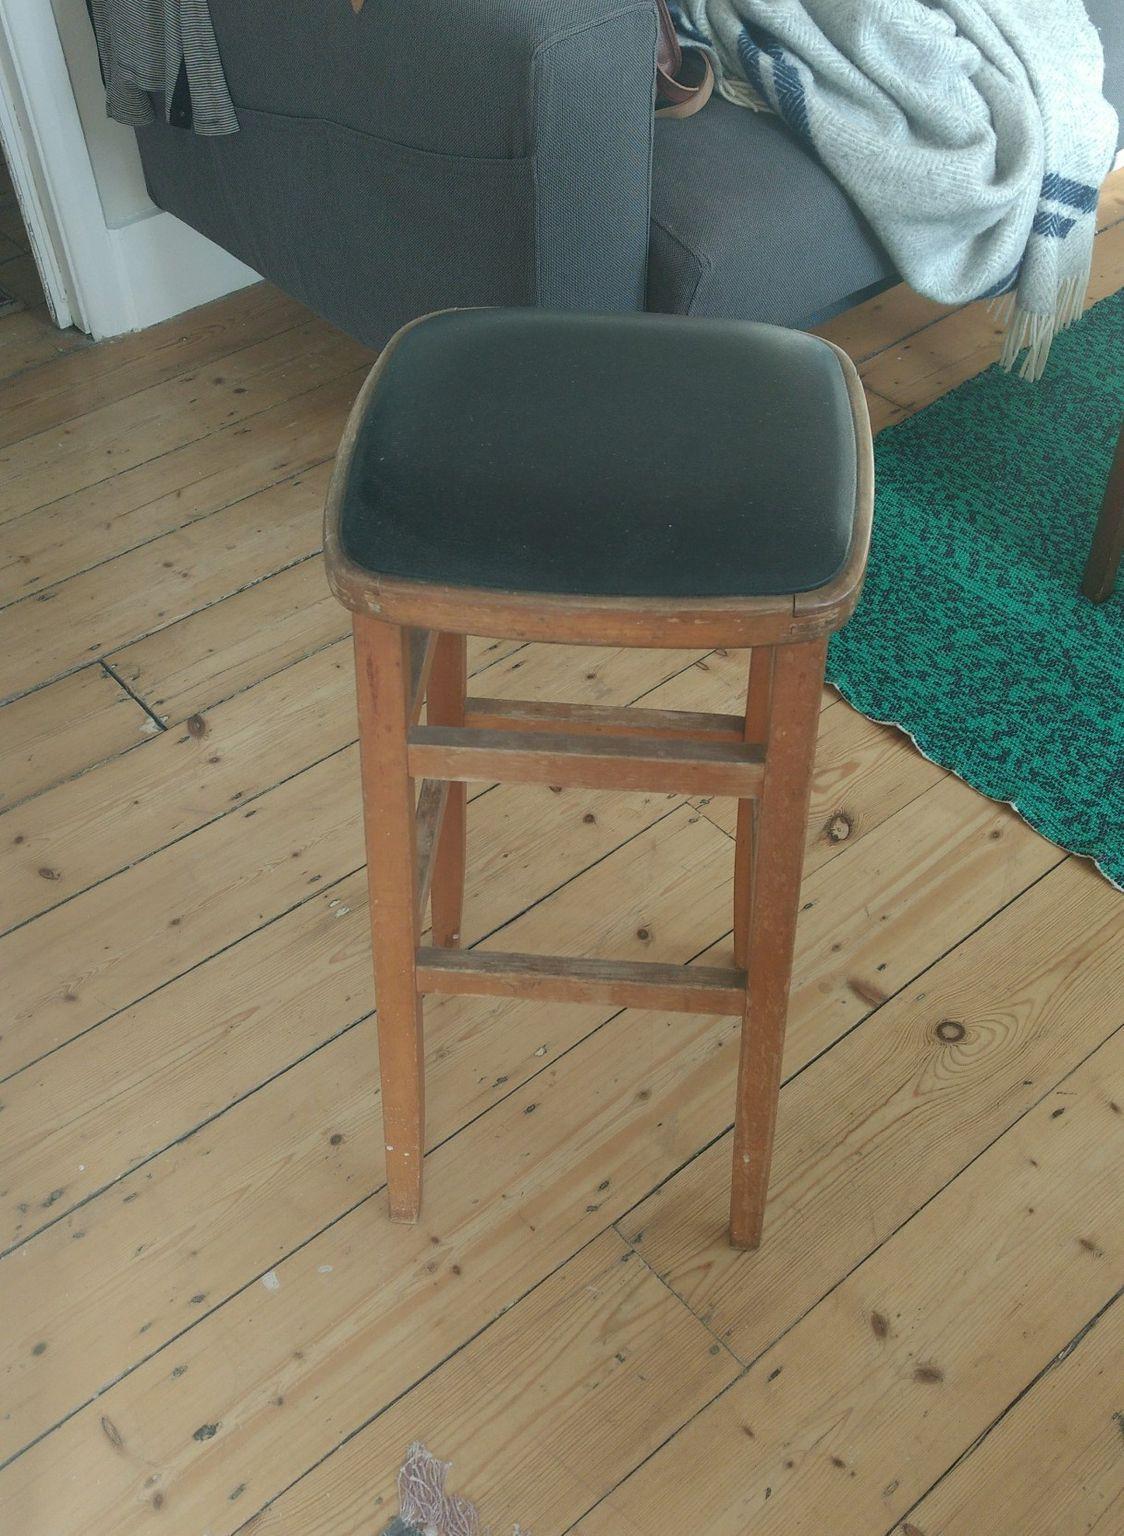 bruce lock and fold hardwood flooring reviews of https en shpock com i wt7q6md2r0uvttje 2017 06 21t142135 pertaining to wooden stool 7772202f